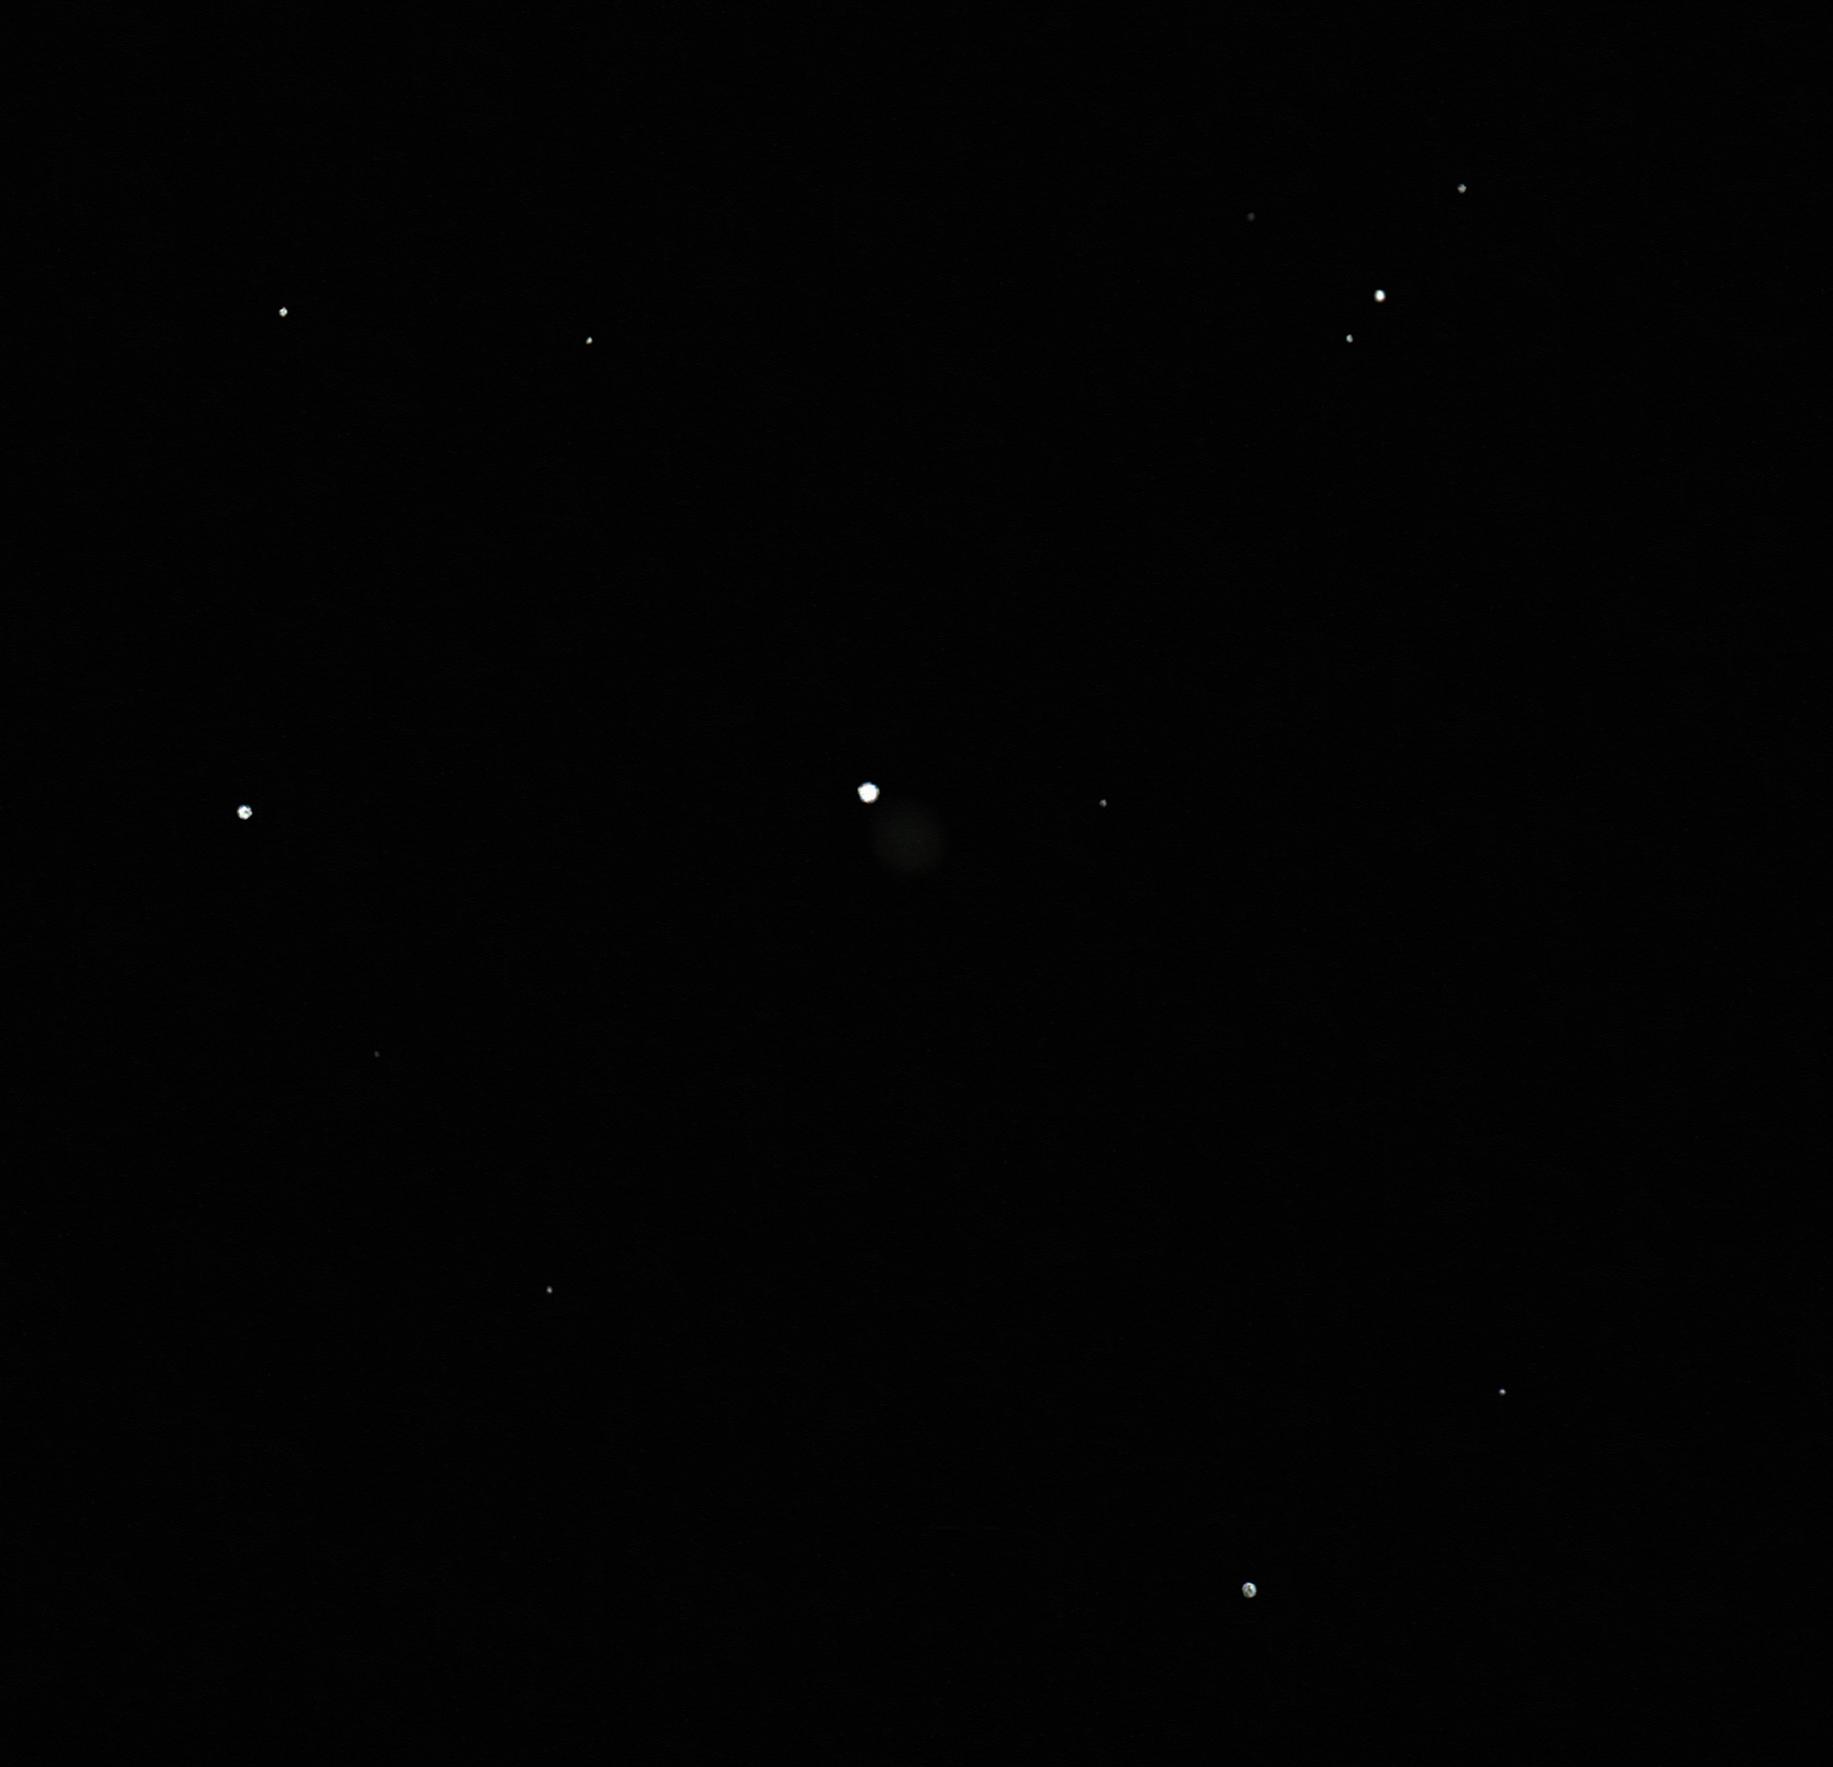 ngc 4571 galaxy